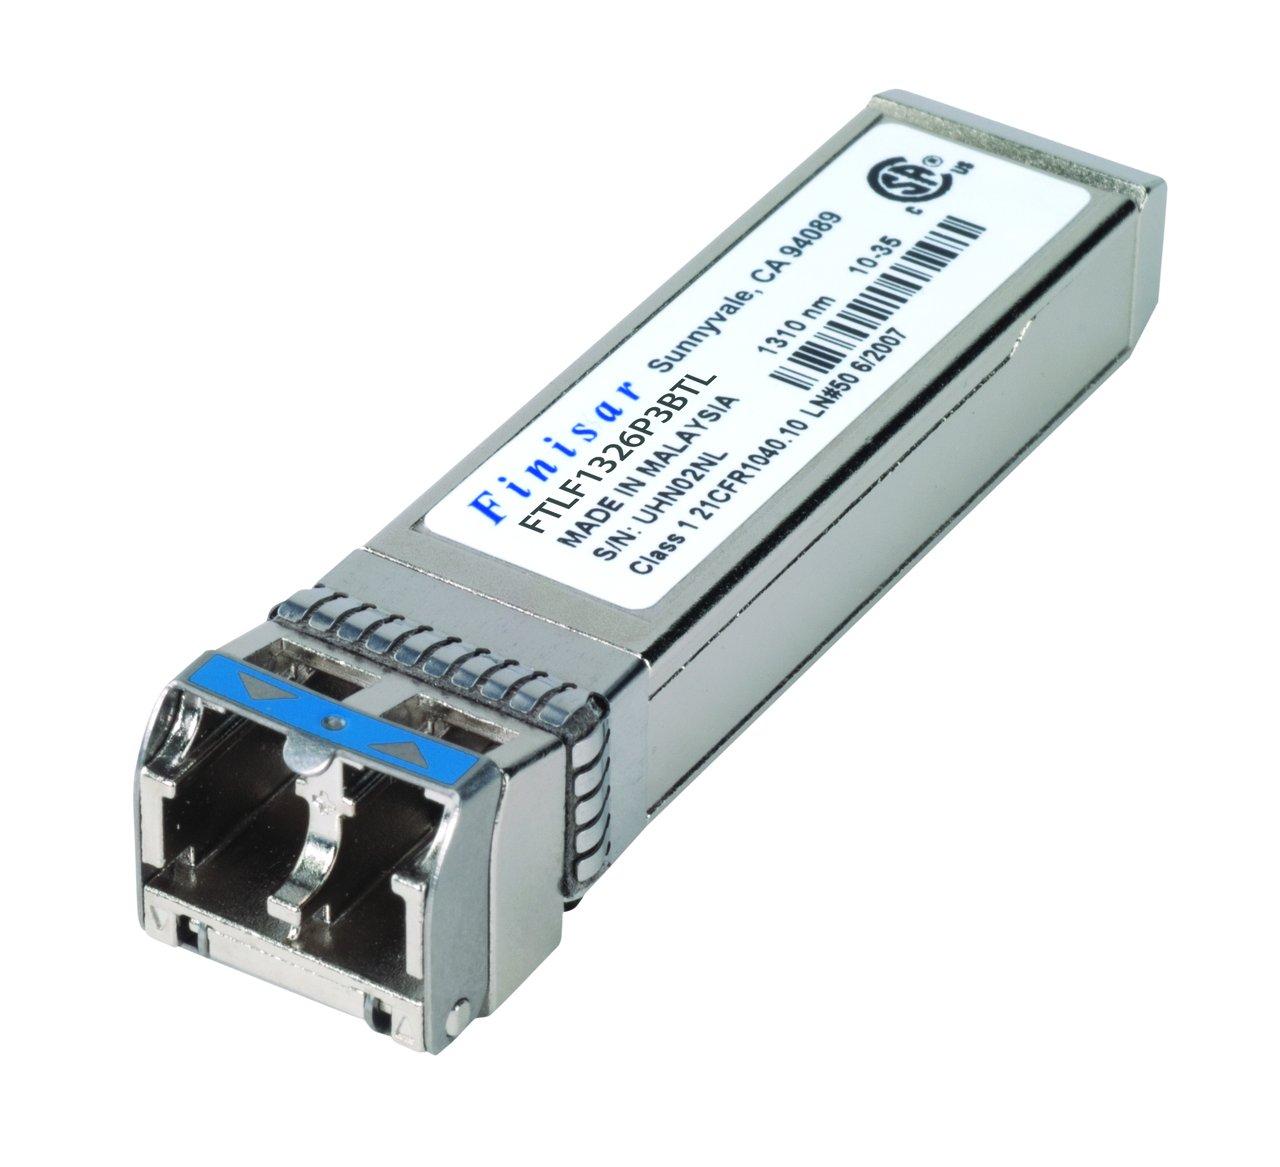 FTLF1326P3BTL 6Gb/s 1310nm Wireless SFP+ Transceiver by Finisar